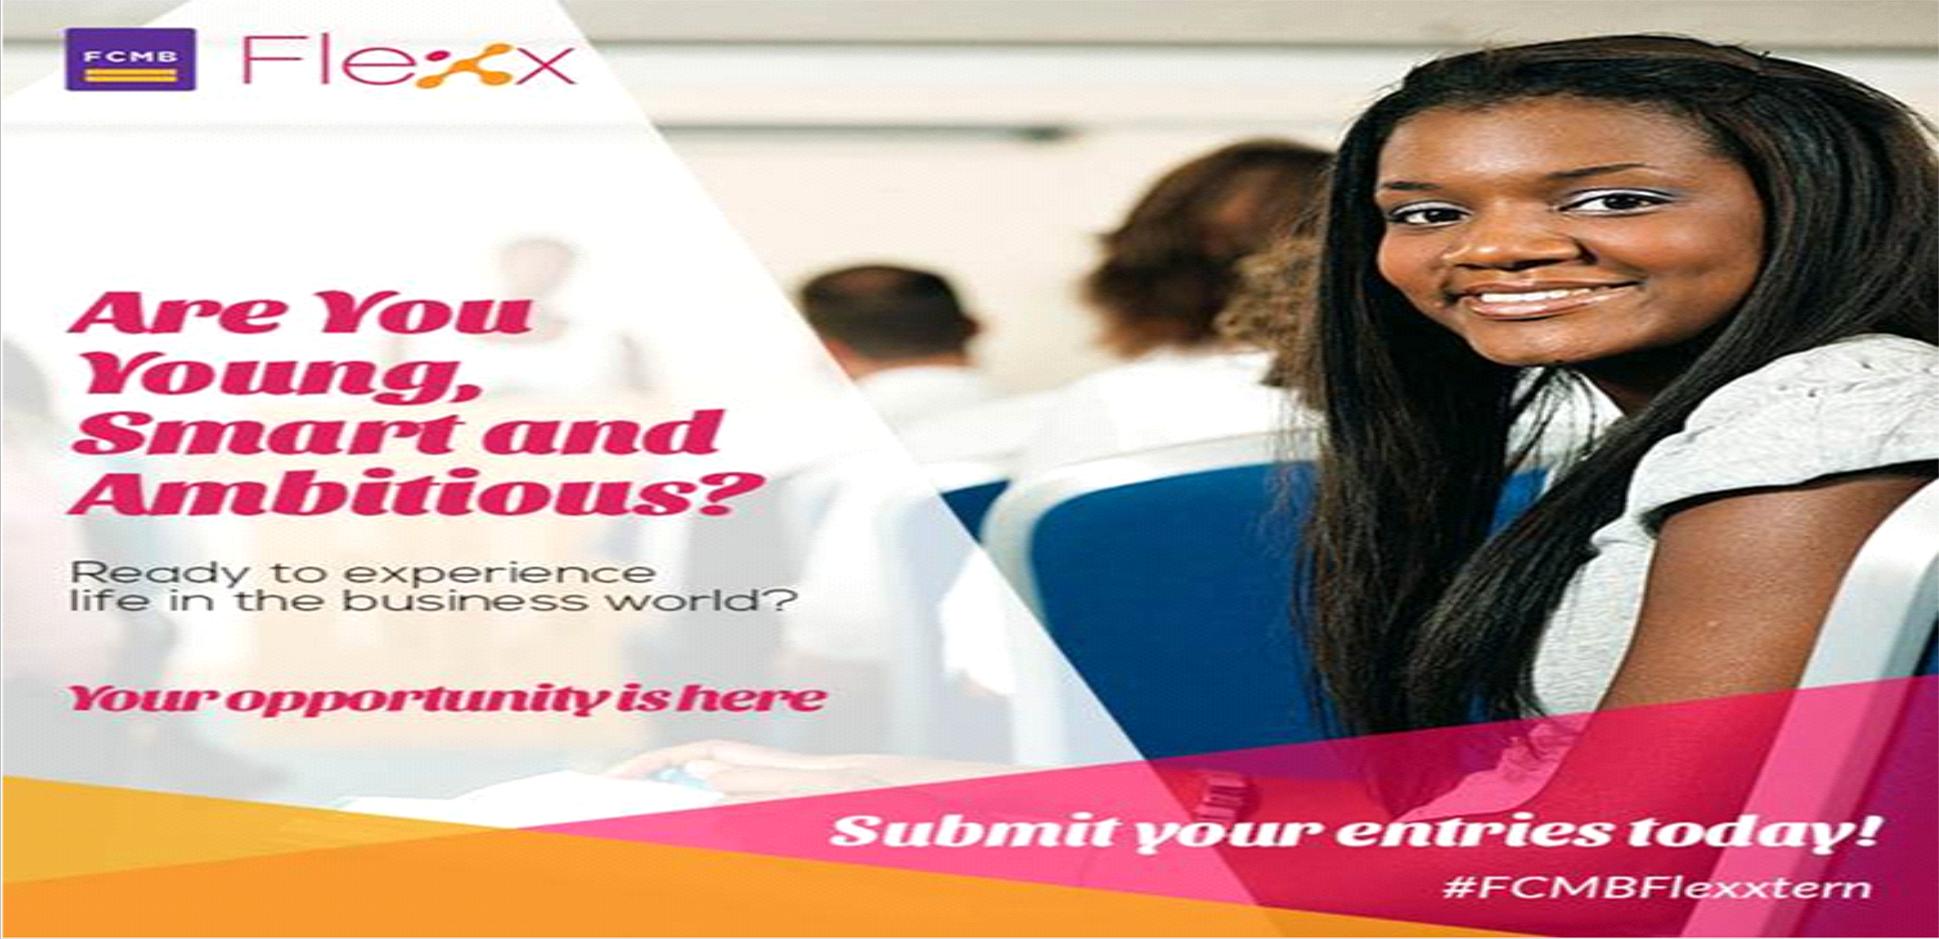 Orijoreporter.com, #FCMBFlexxtern Internship Contest